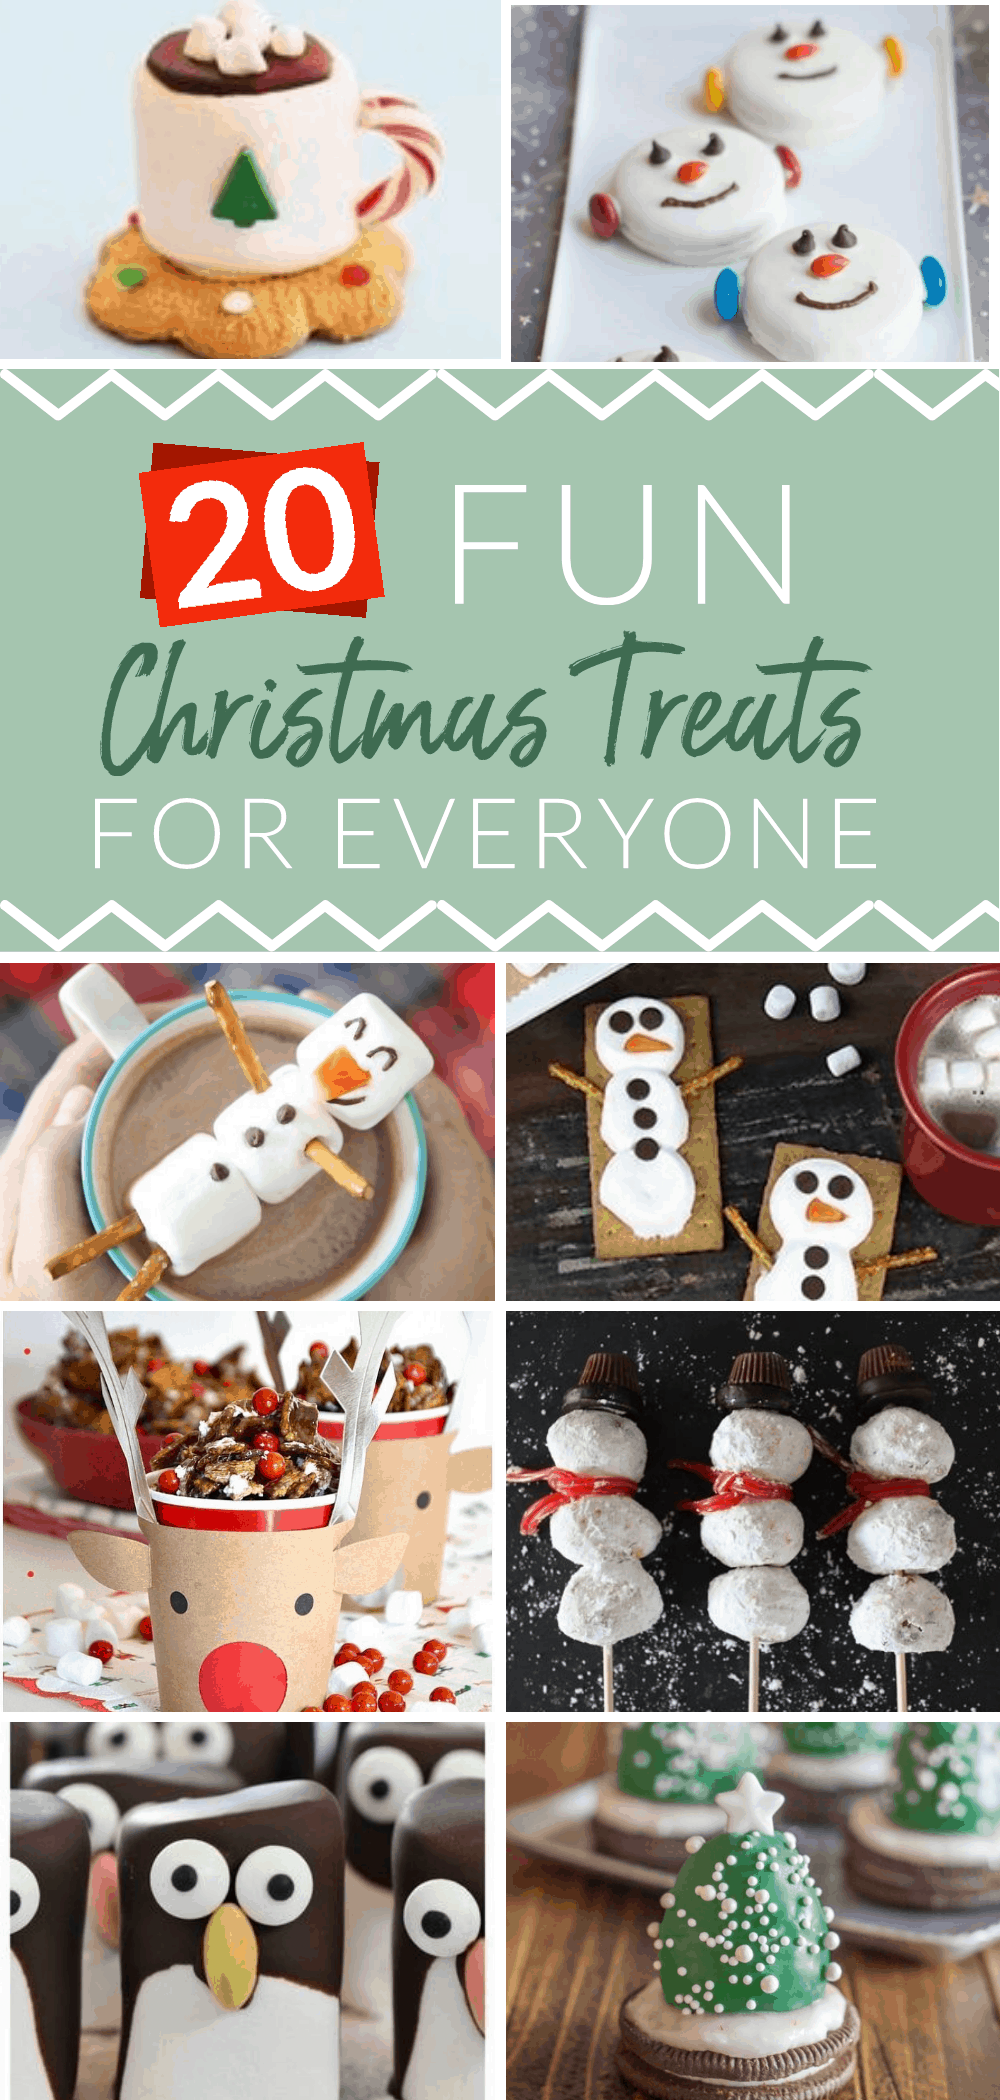 20 Easy Christmas Treats To Make This Holiday